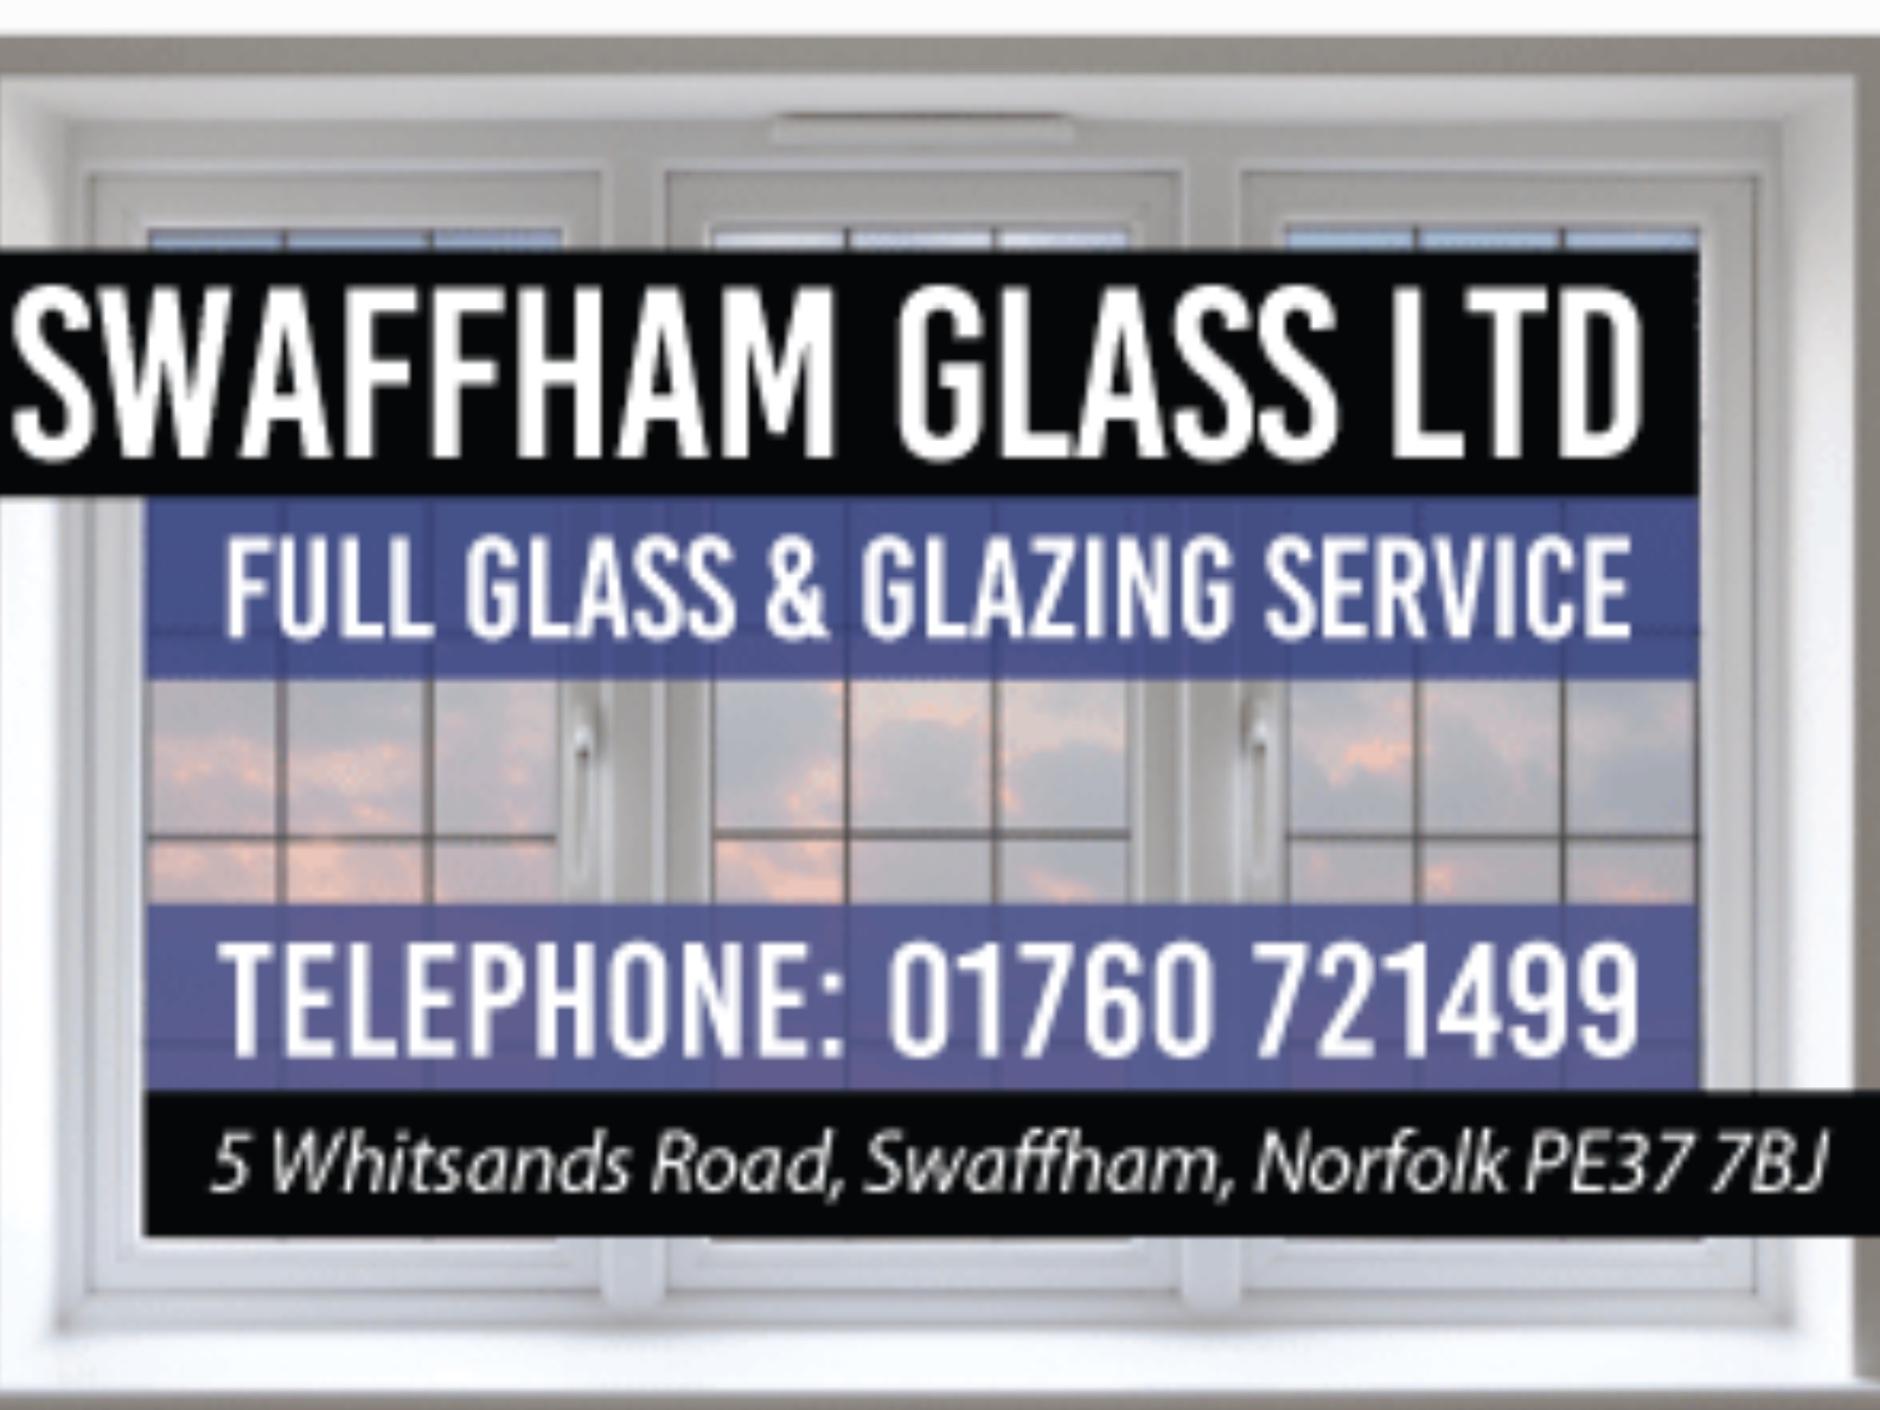 Swaffham Glass LTD